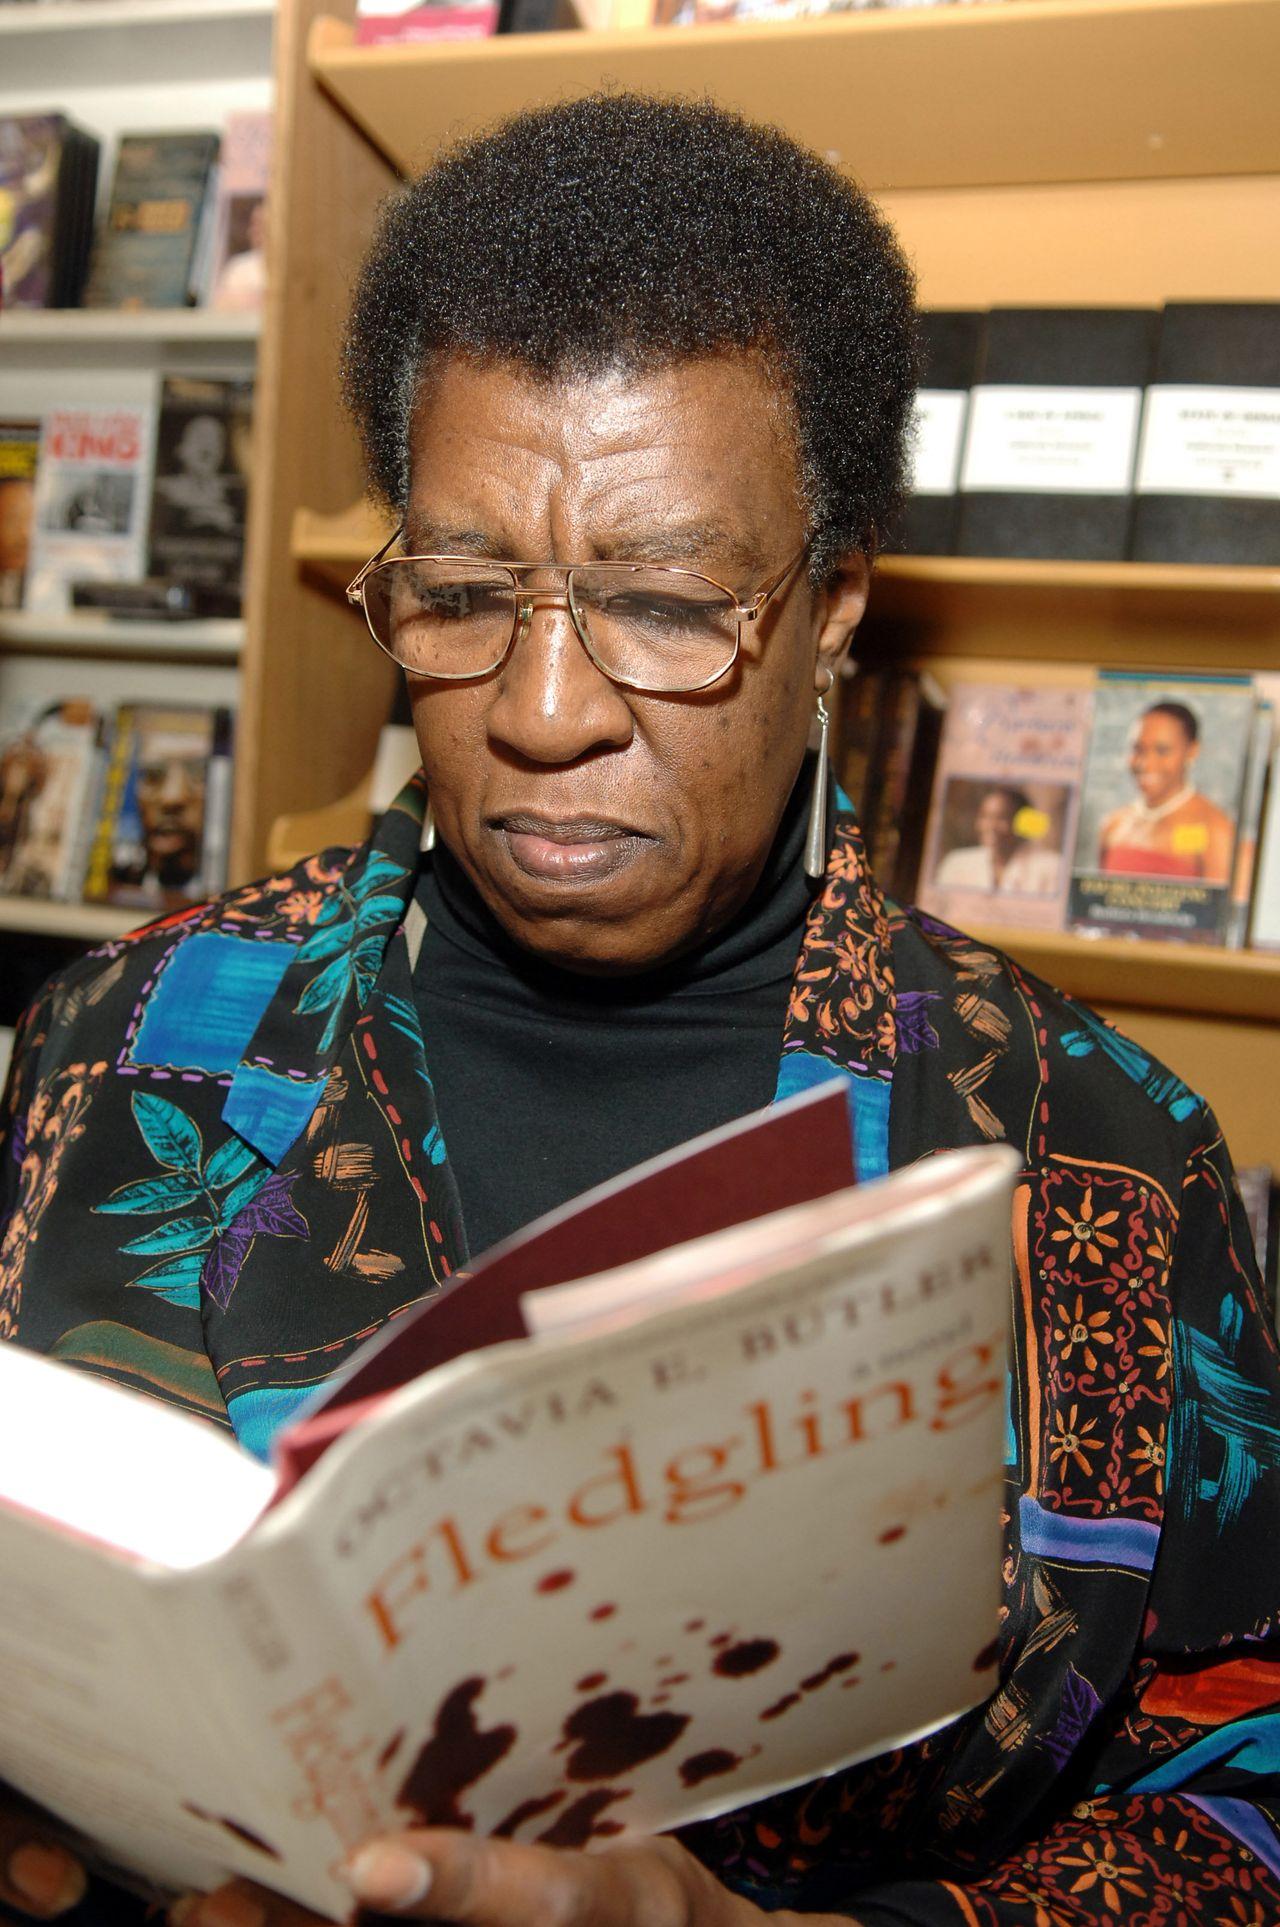 American sci-fi writer Octavia E. Butler (1947-2006).